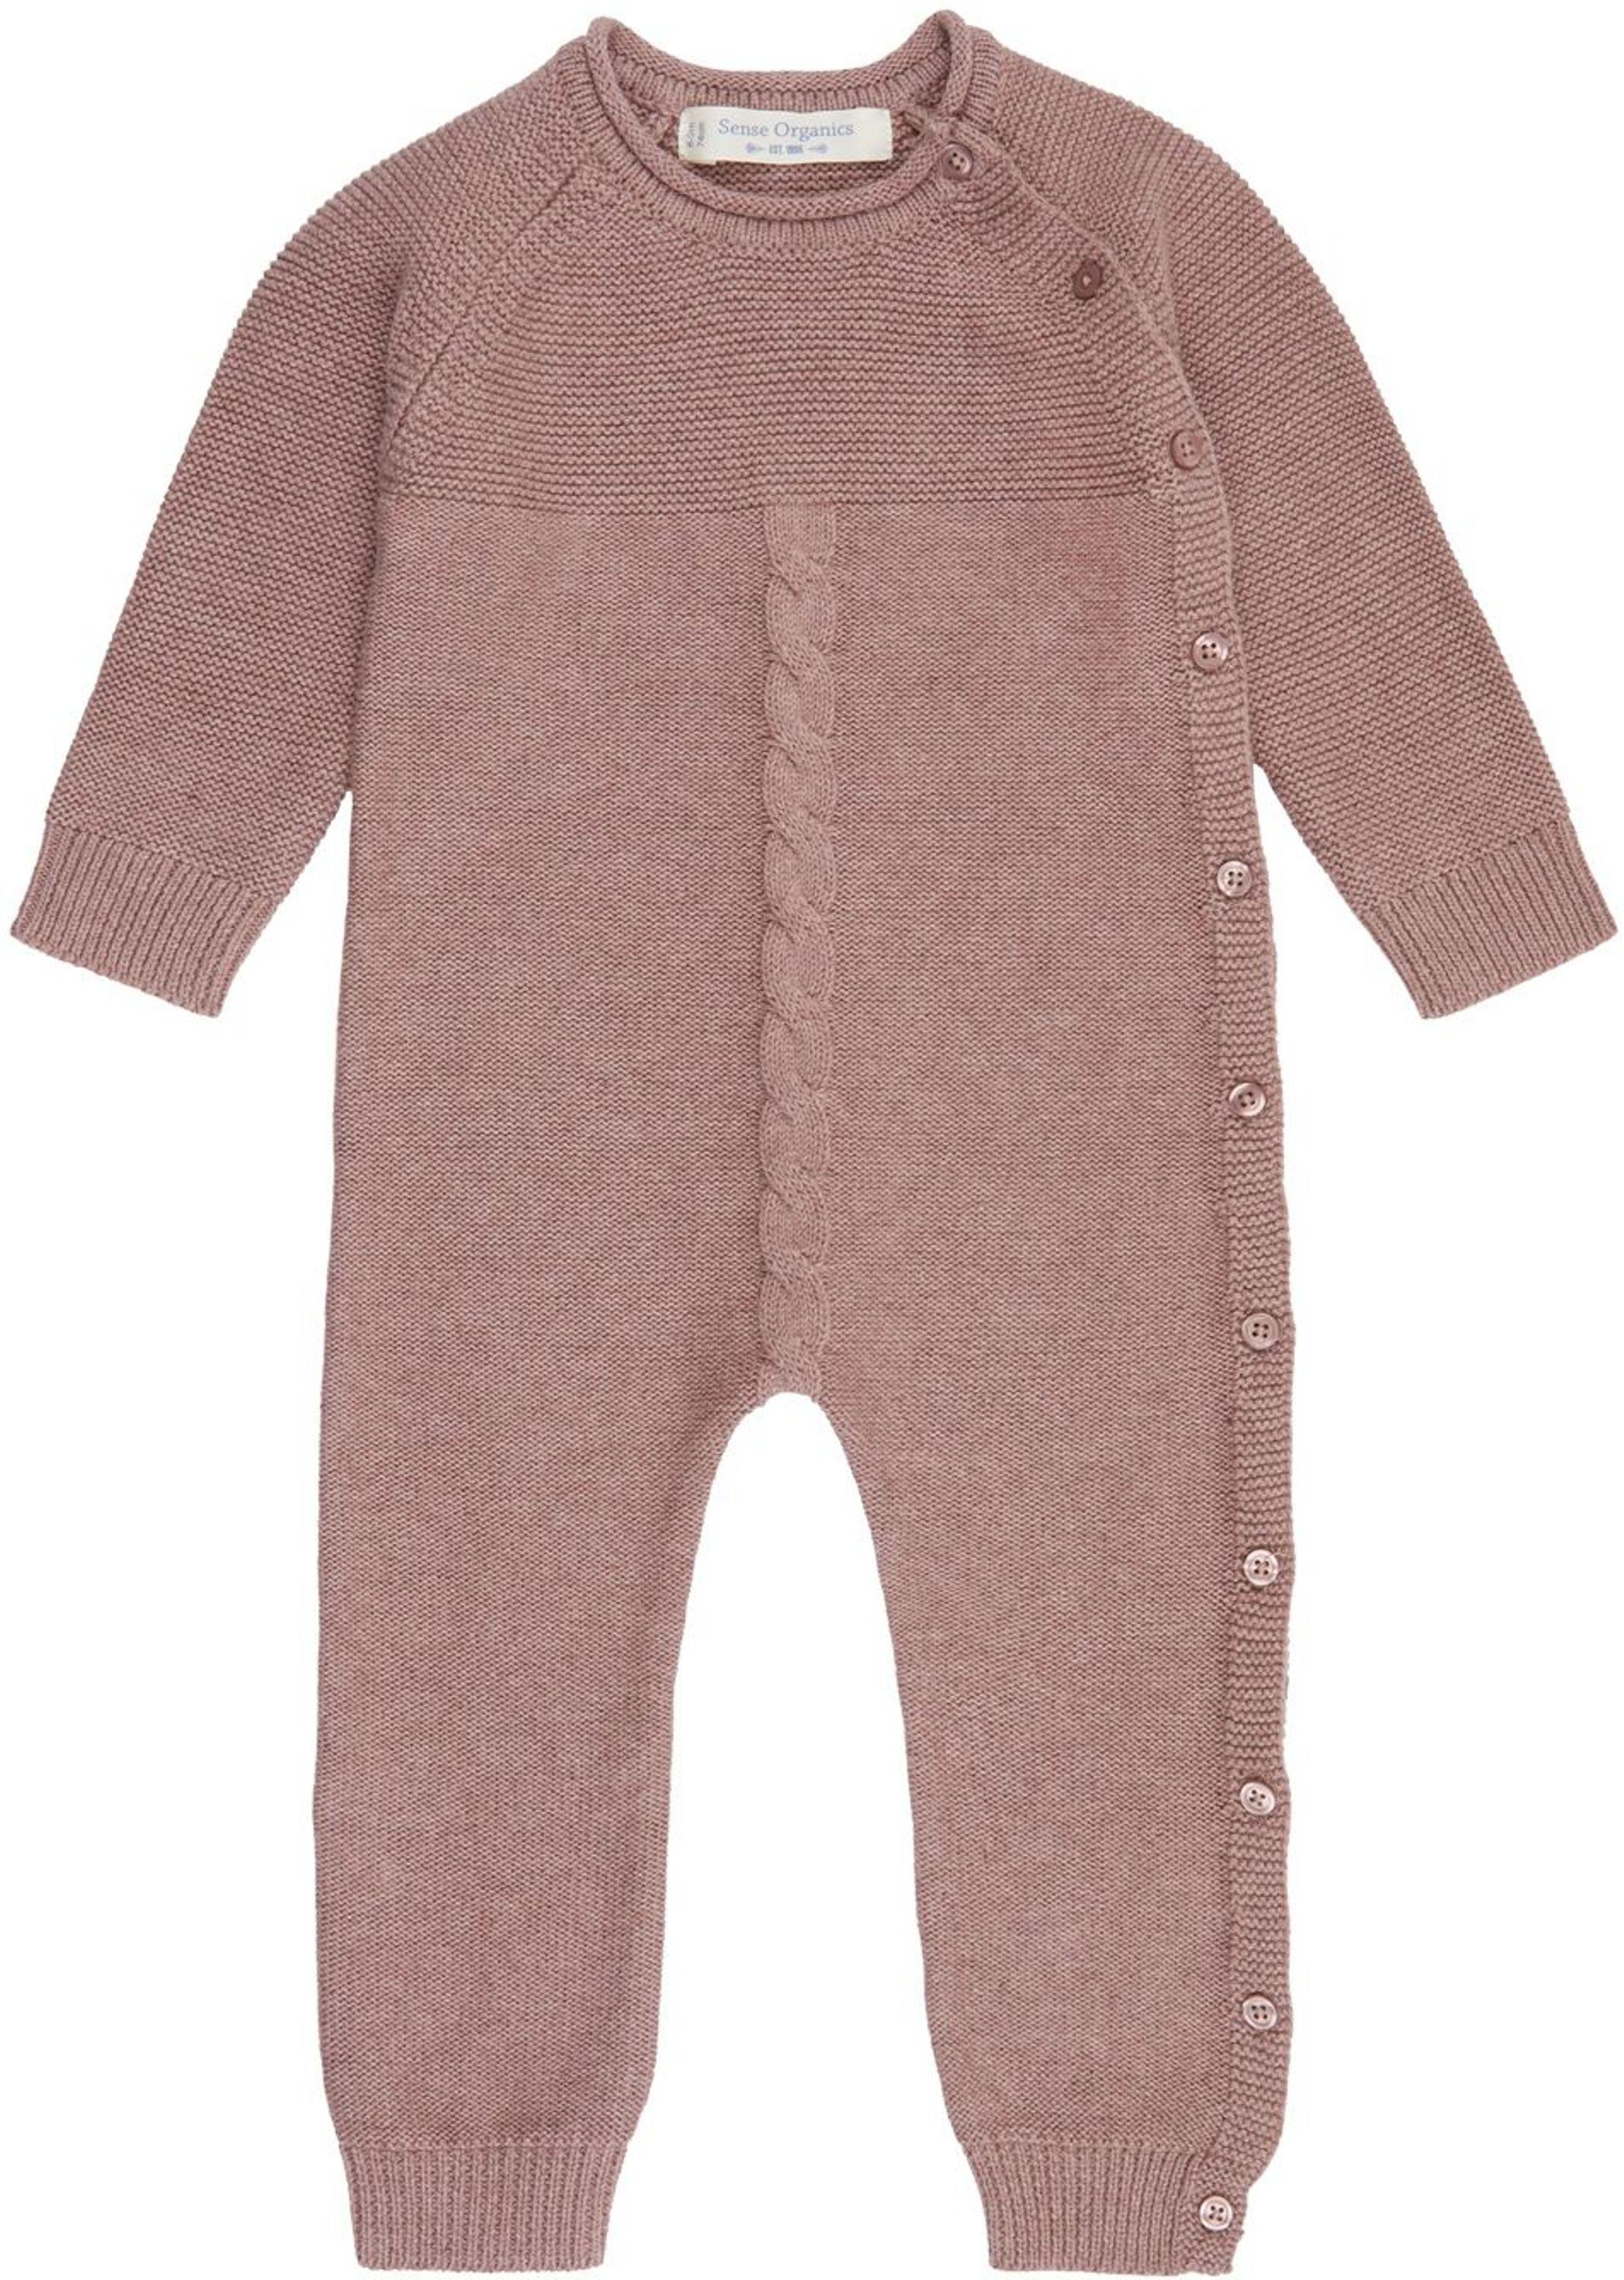 Sense Organic YACI Baby Knitted Romper woodrose